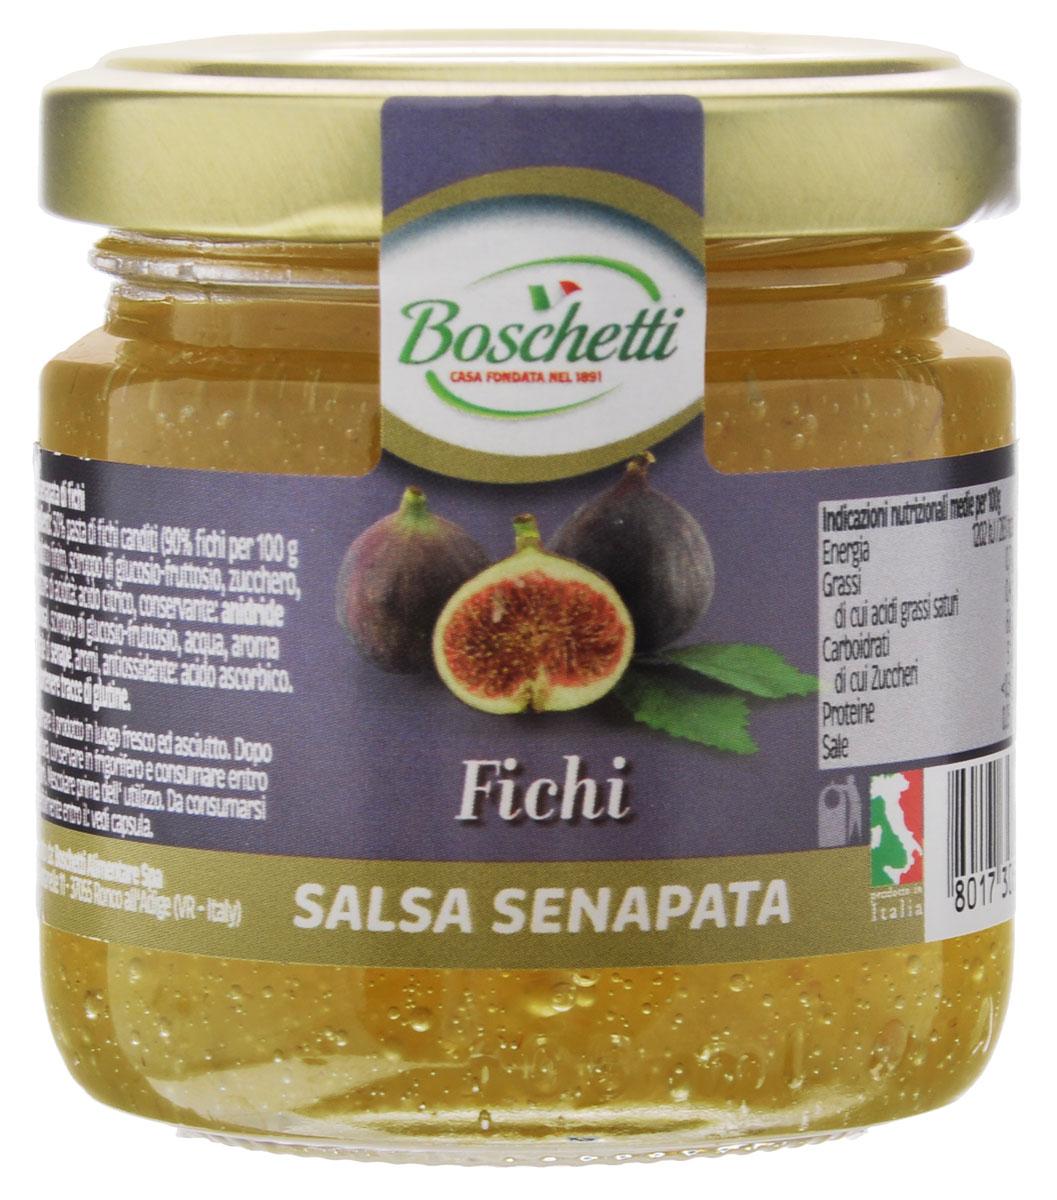 Boschetti Fichi соус сальса, 120 г SP#6435AY